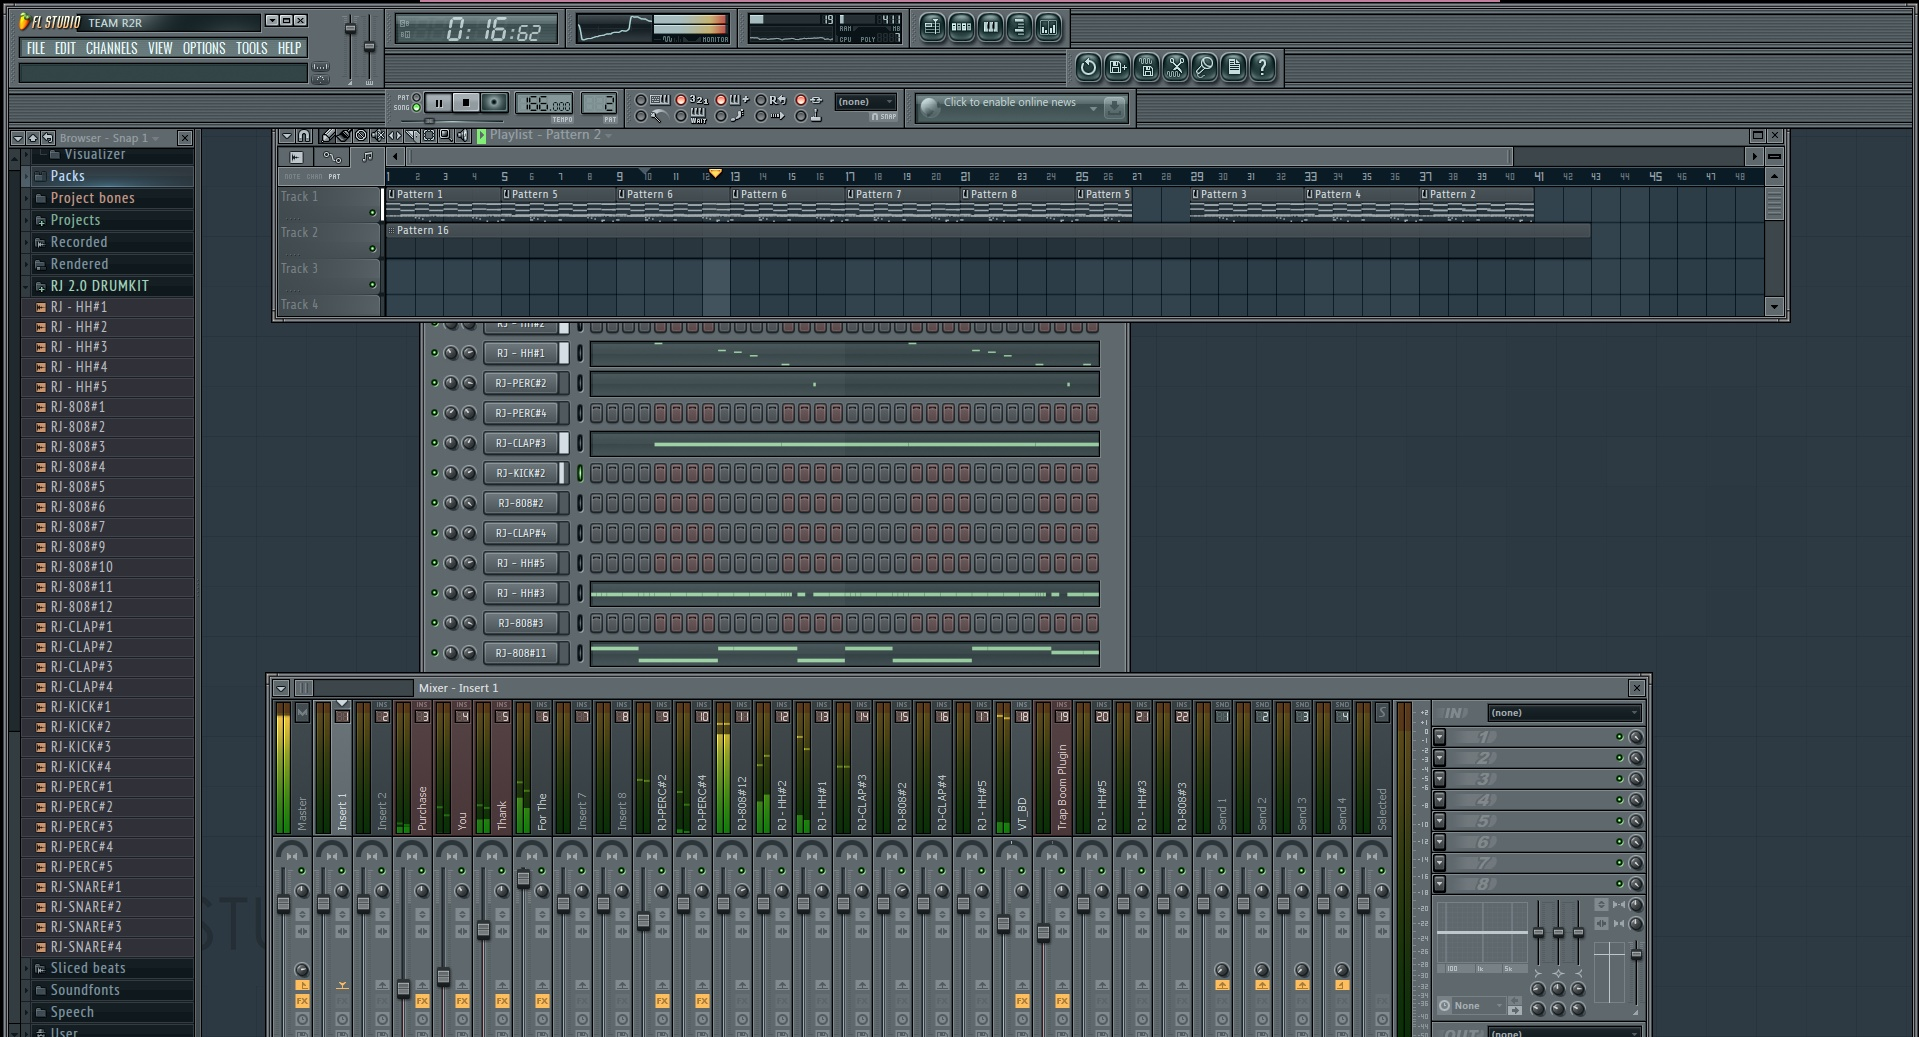 Ronny J x Lil Pump Drumkit (2018) COMES WITH FLP!